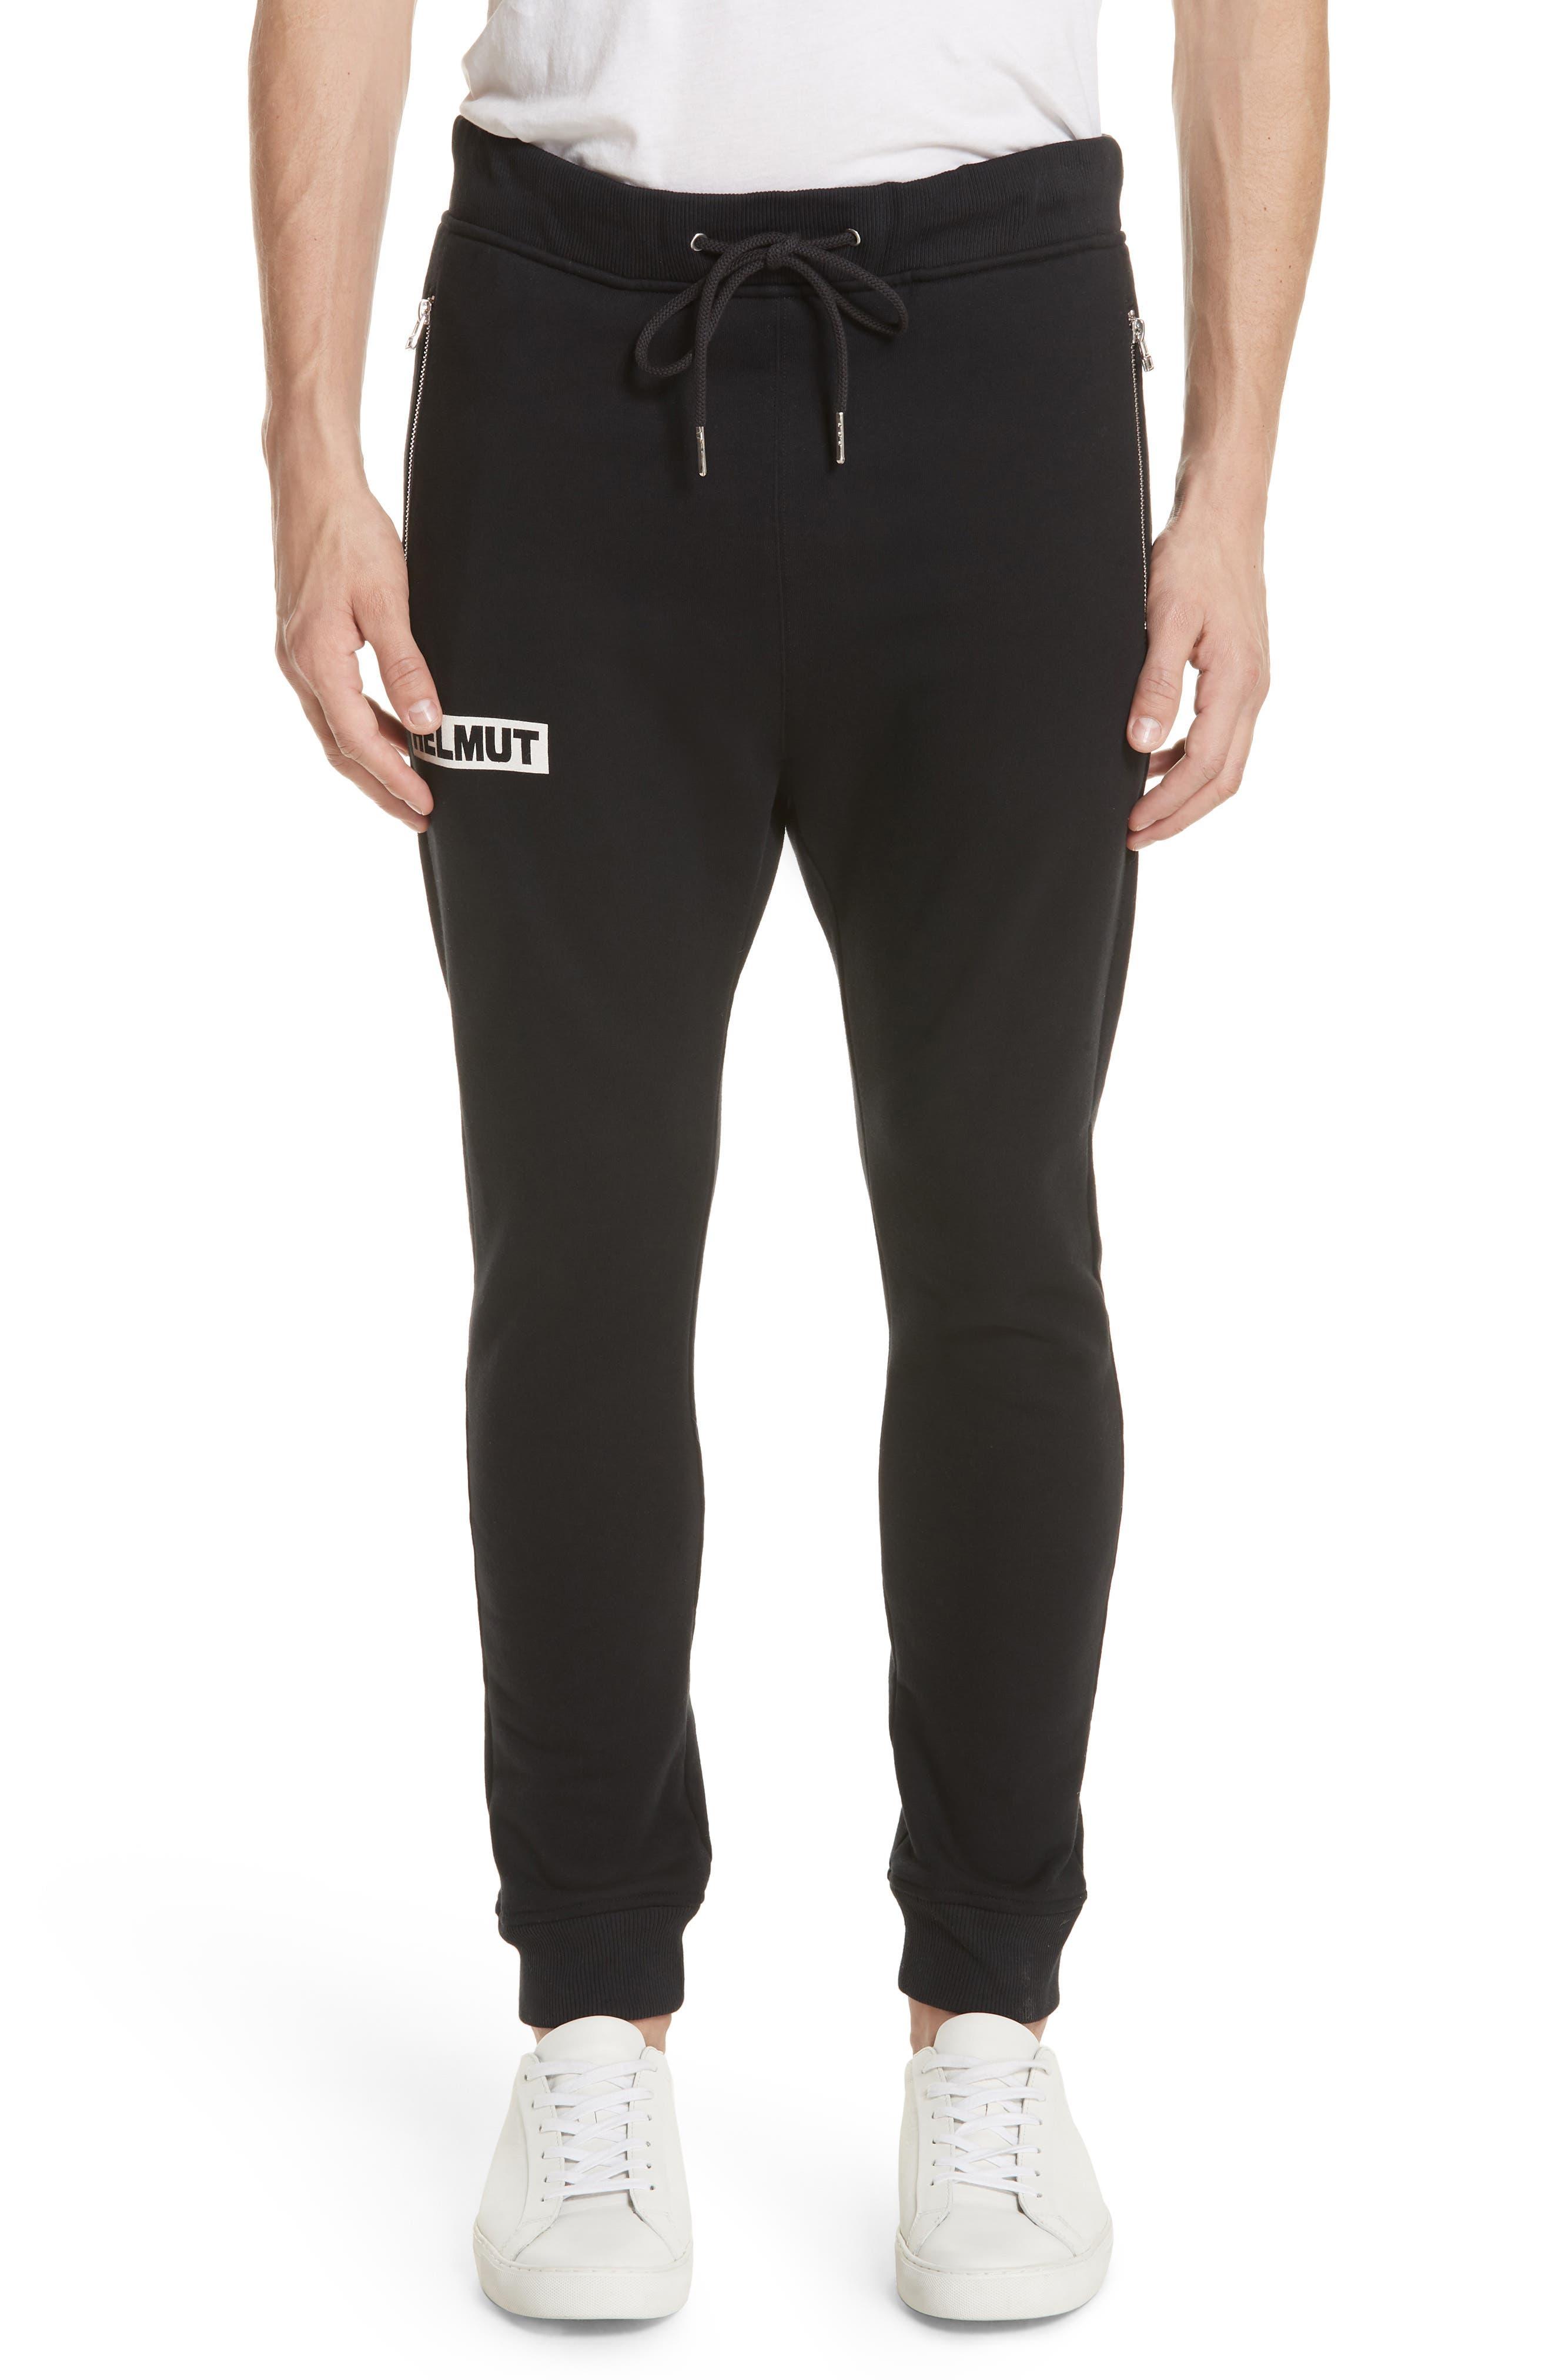 Helmut Lang Logo Print Sweatpants